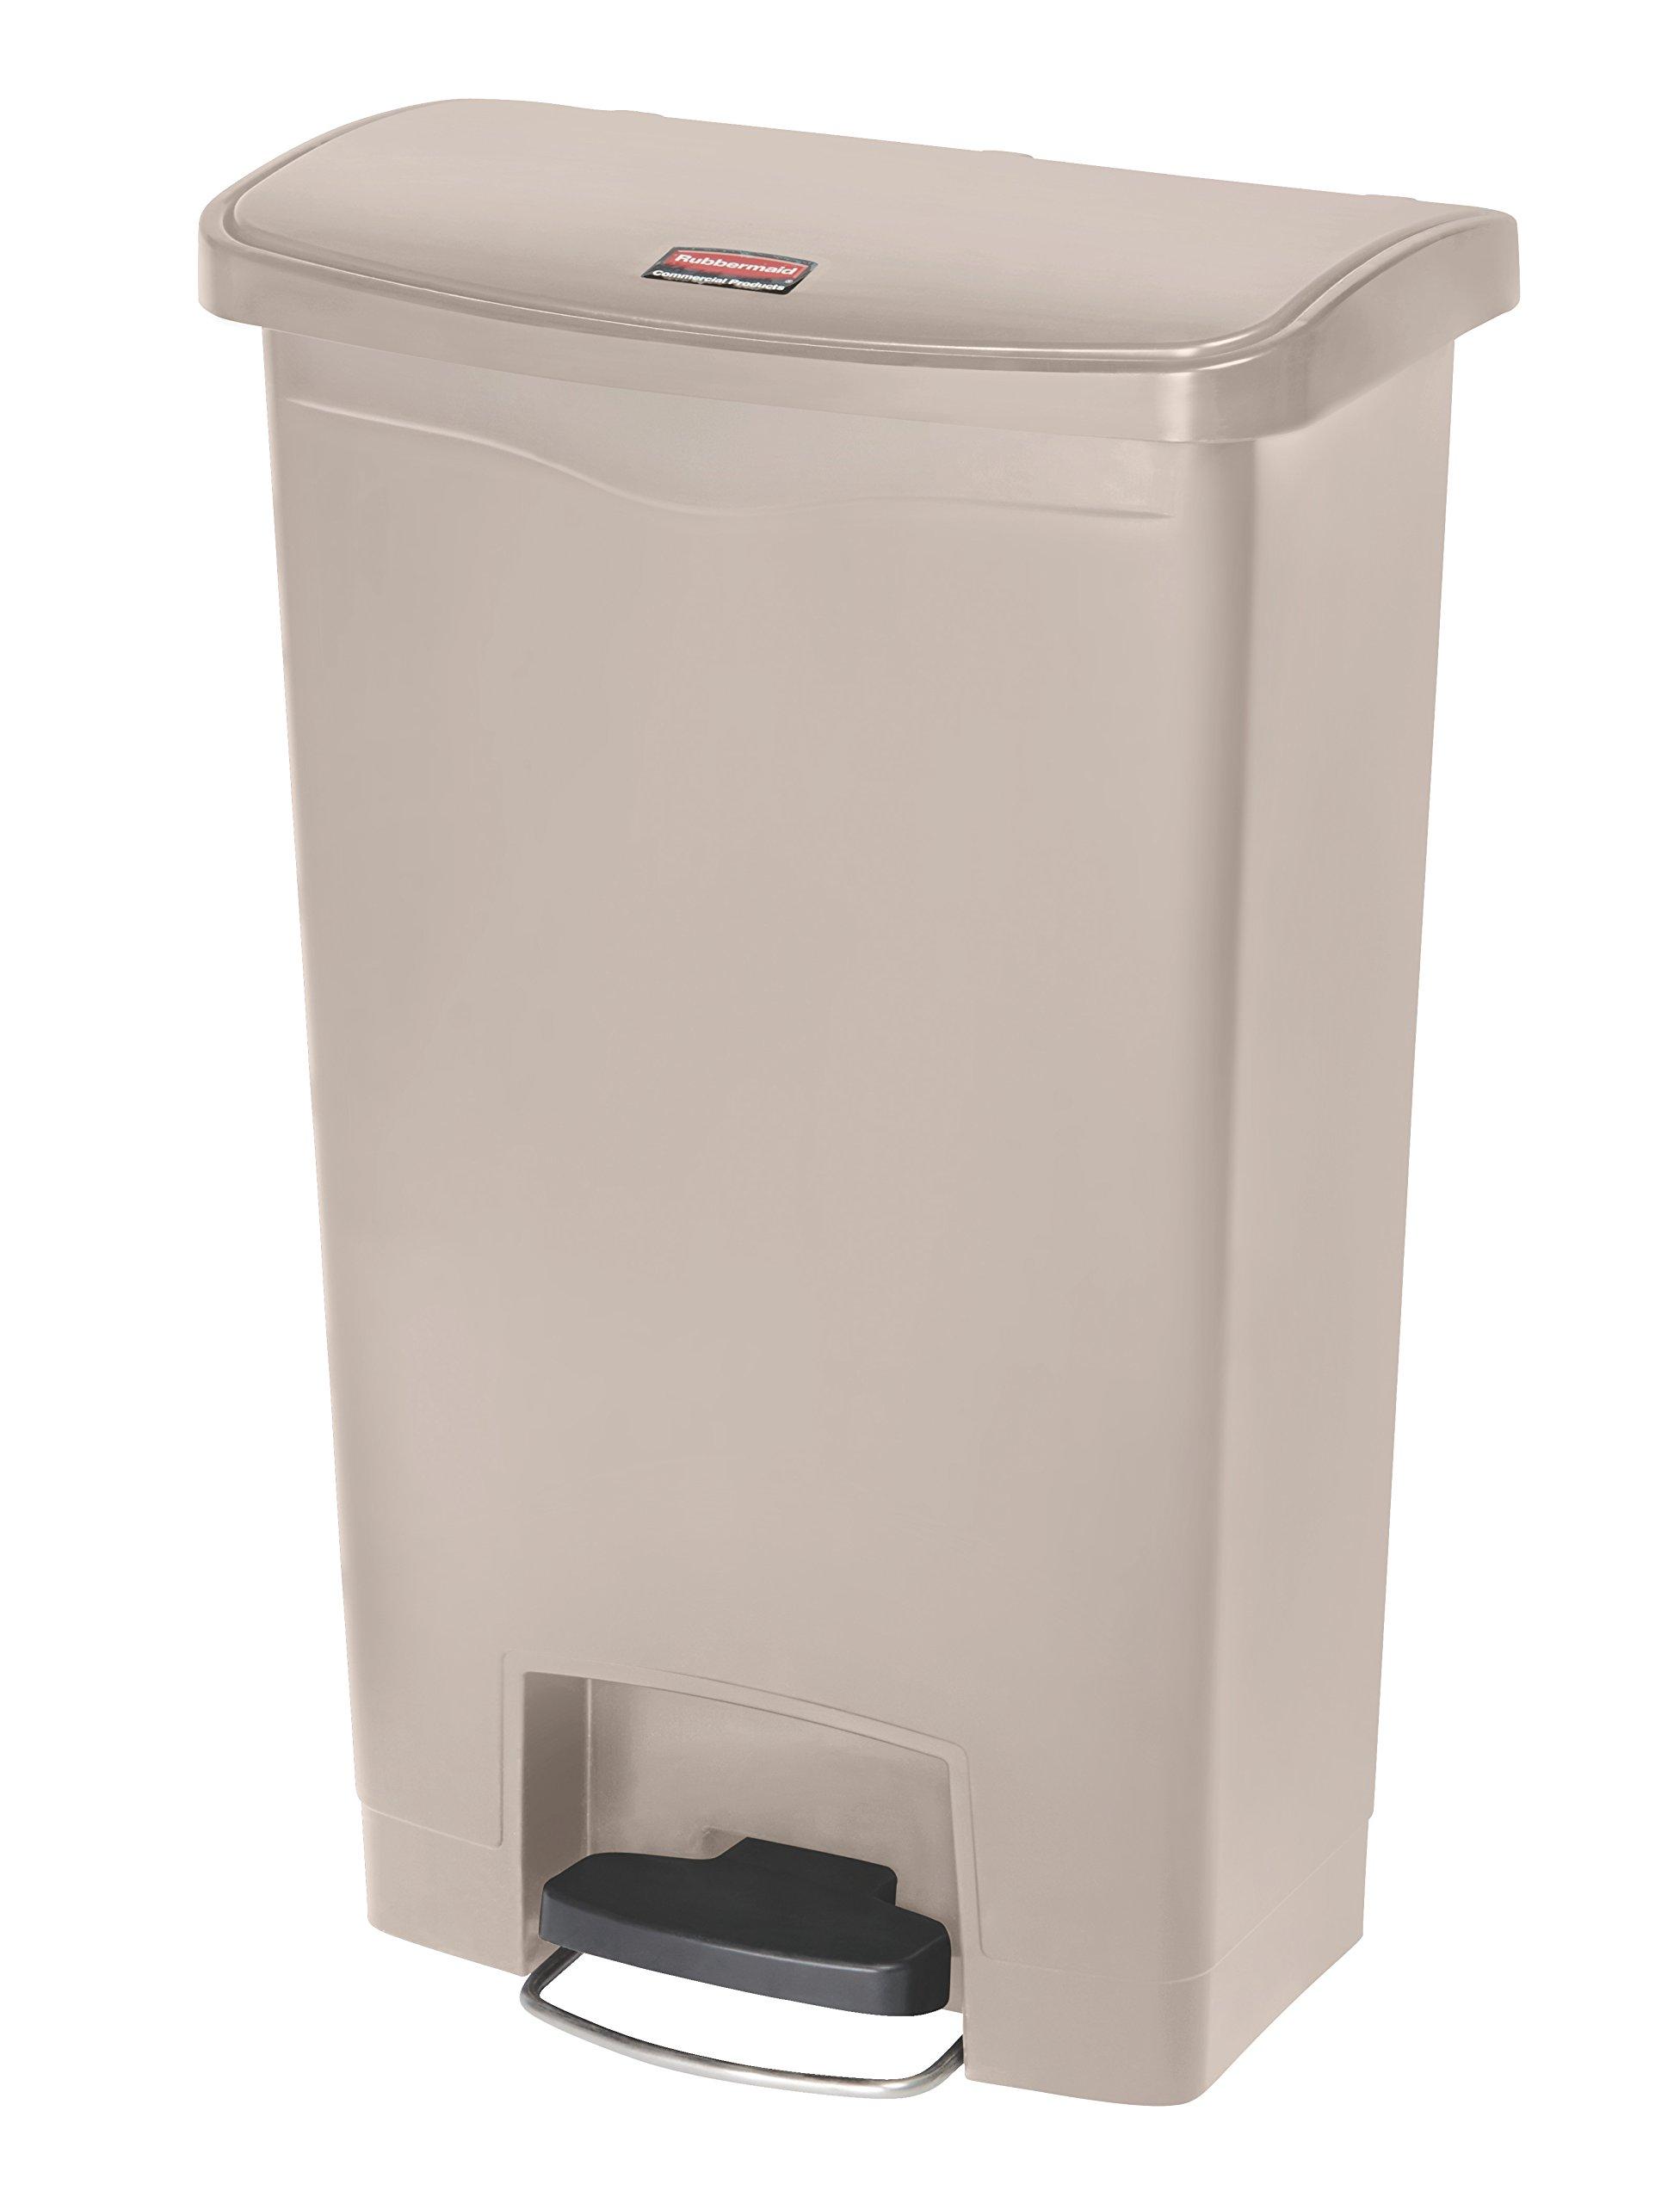 Rubbermaid Commercial Slim Jim Resin Step-On Wastebasket, Front-Step, 13-gallon, Beige (1883458)